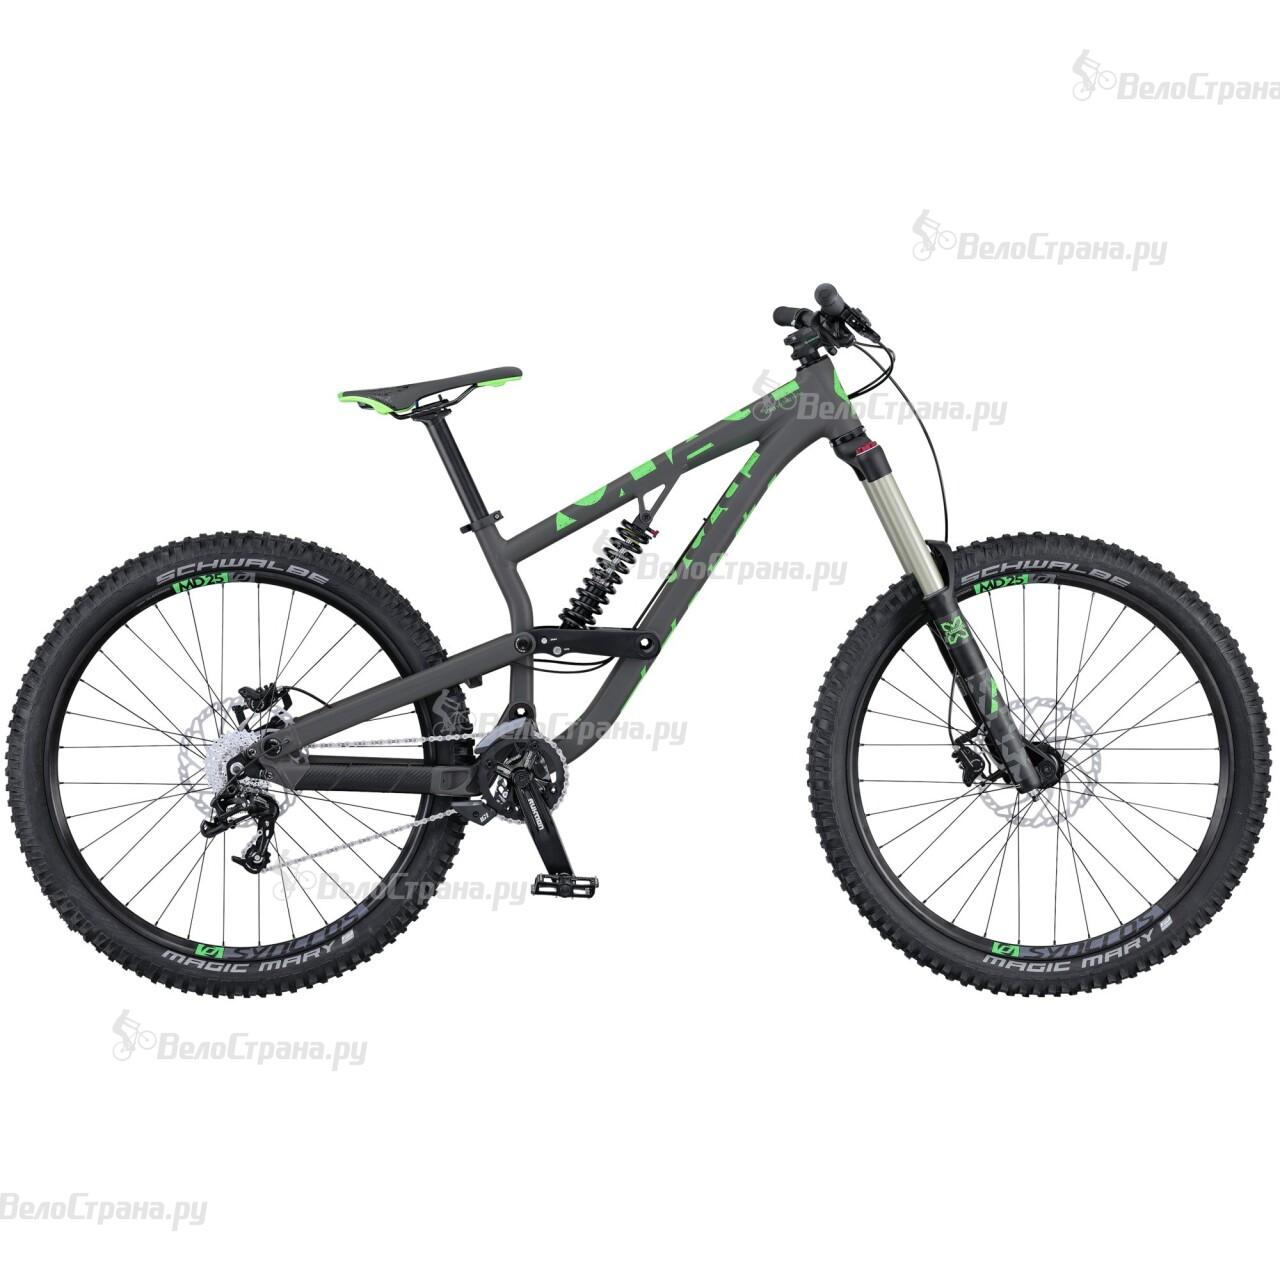 Велосипед Scott VOLTAGE FR 730 (2016)